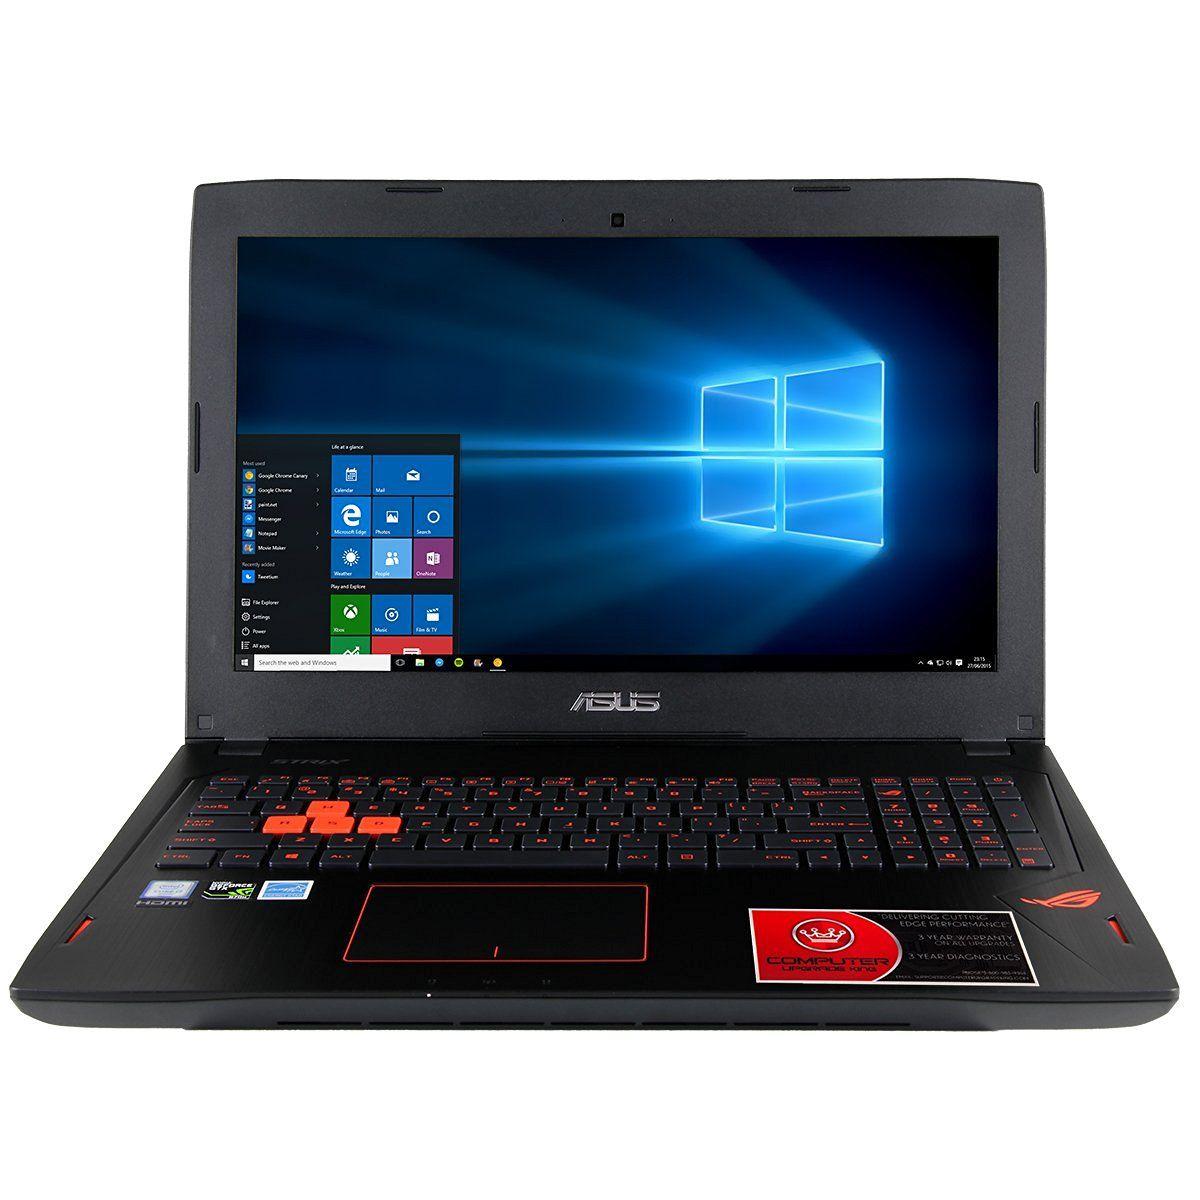 ASUS ROG GL502VS gaming laptop review | Computers | Pinterest